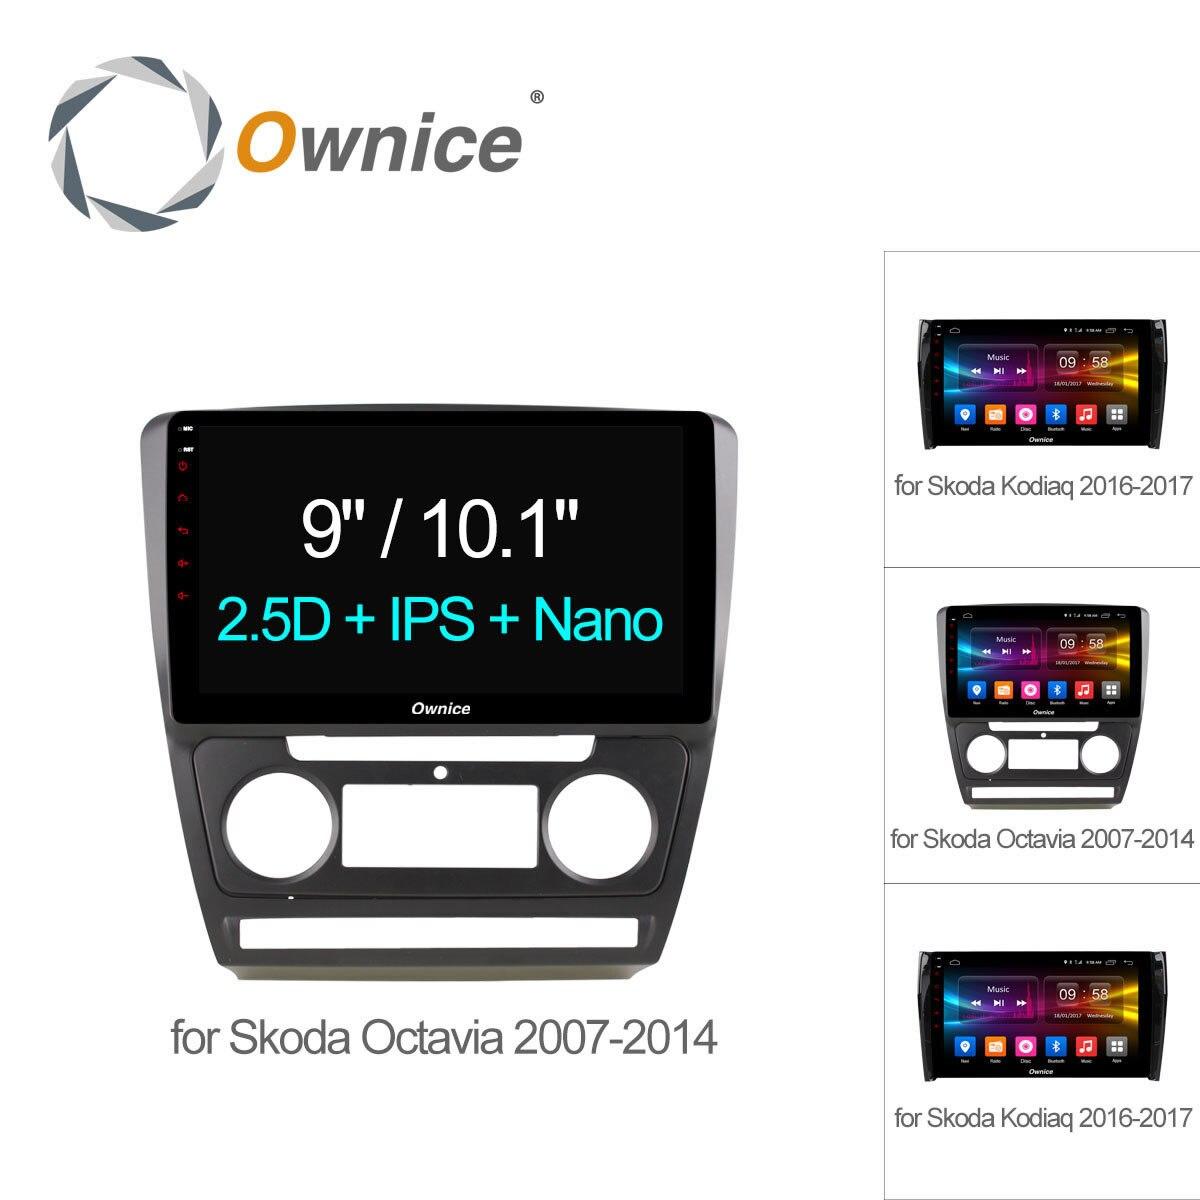 Ownice C500+ 10.1 Octa Octa core Android 6.0 Car DVD Player GPS Navigation for Skoda Octavia 2007 2008 KODIAQ 4G SIM TPMS DAB+